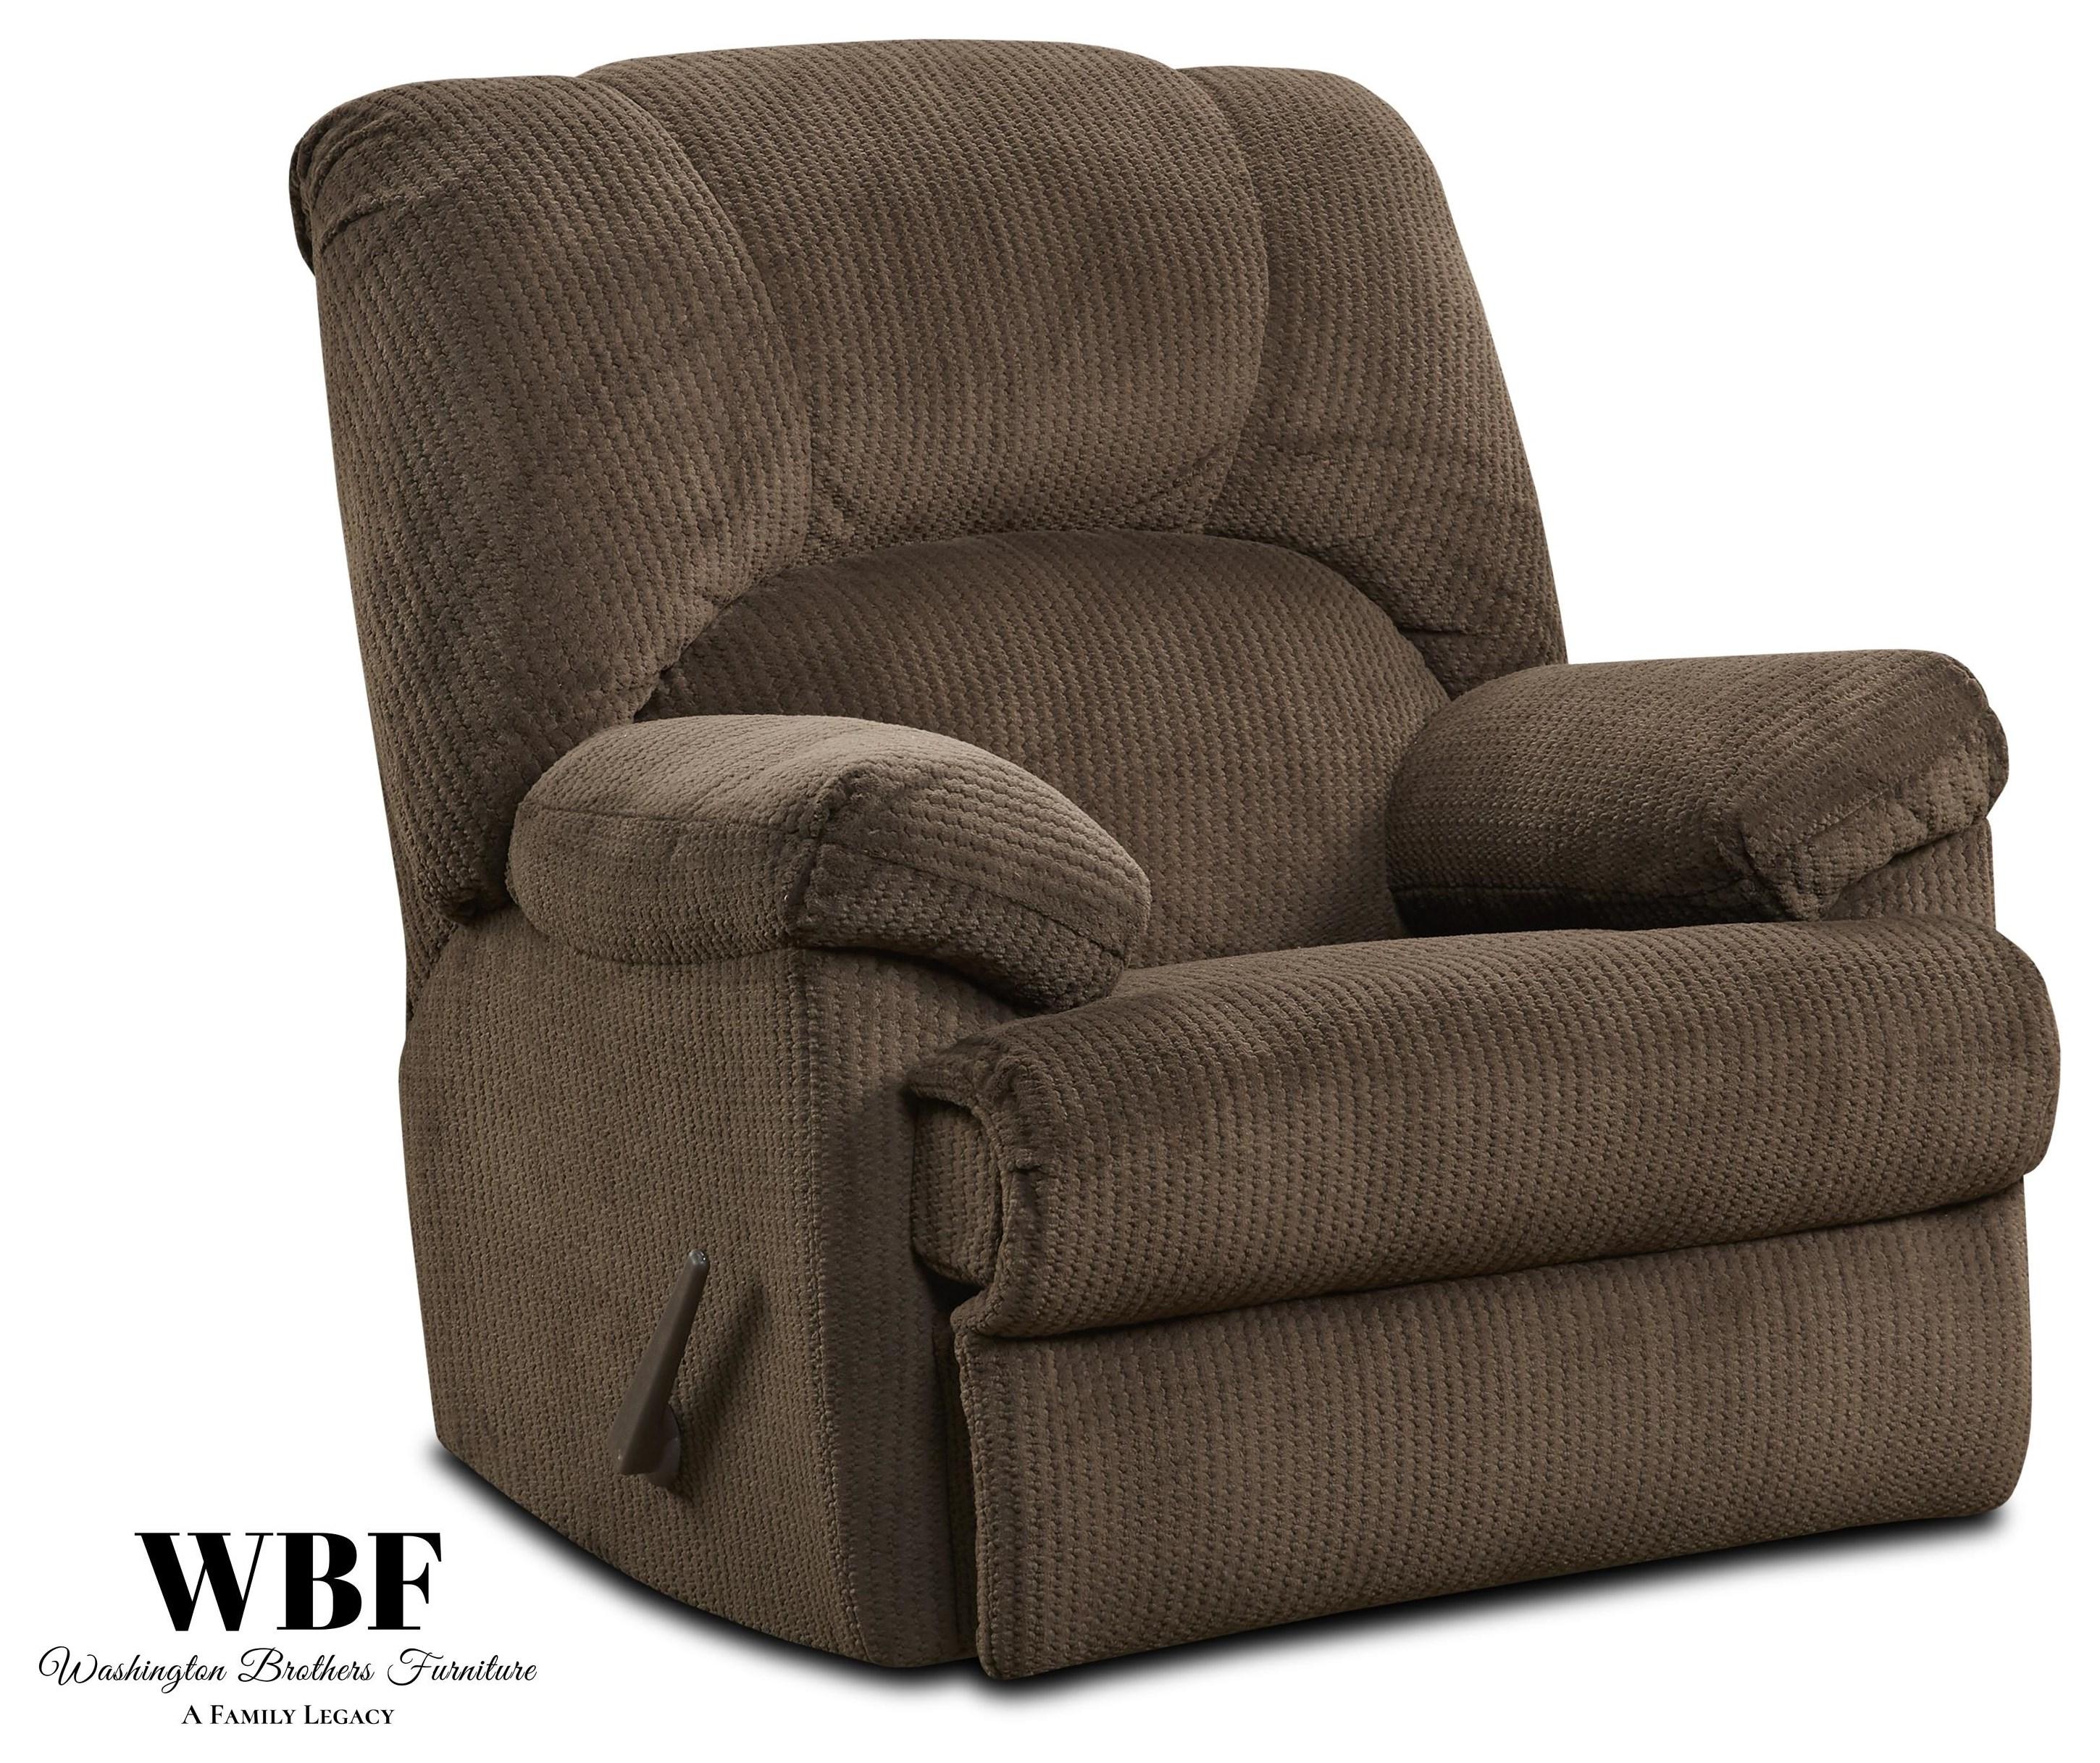 9015 Rocker Recliner - Chocolate by Washington Brothers Furniture at Furniture Fair - North Carolina